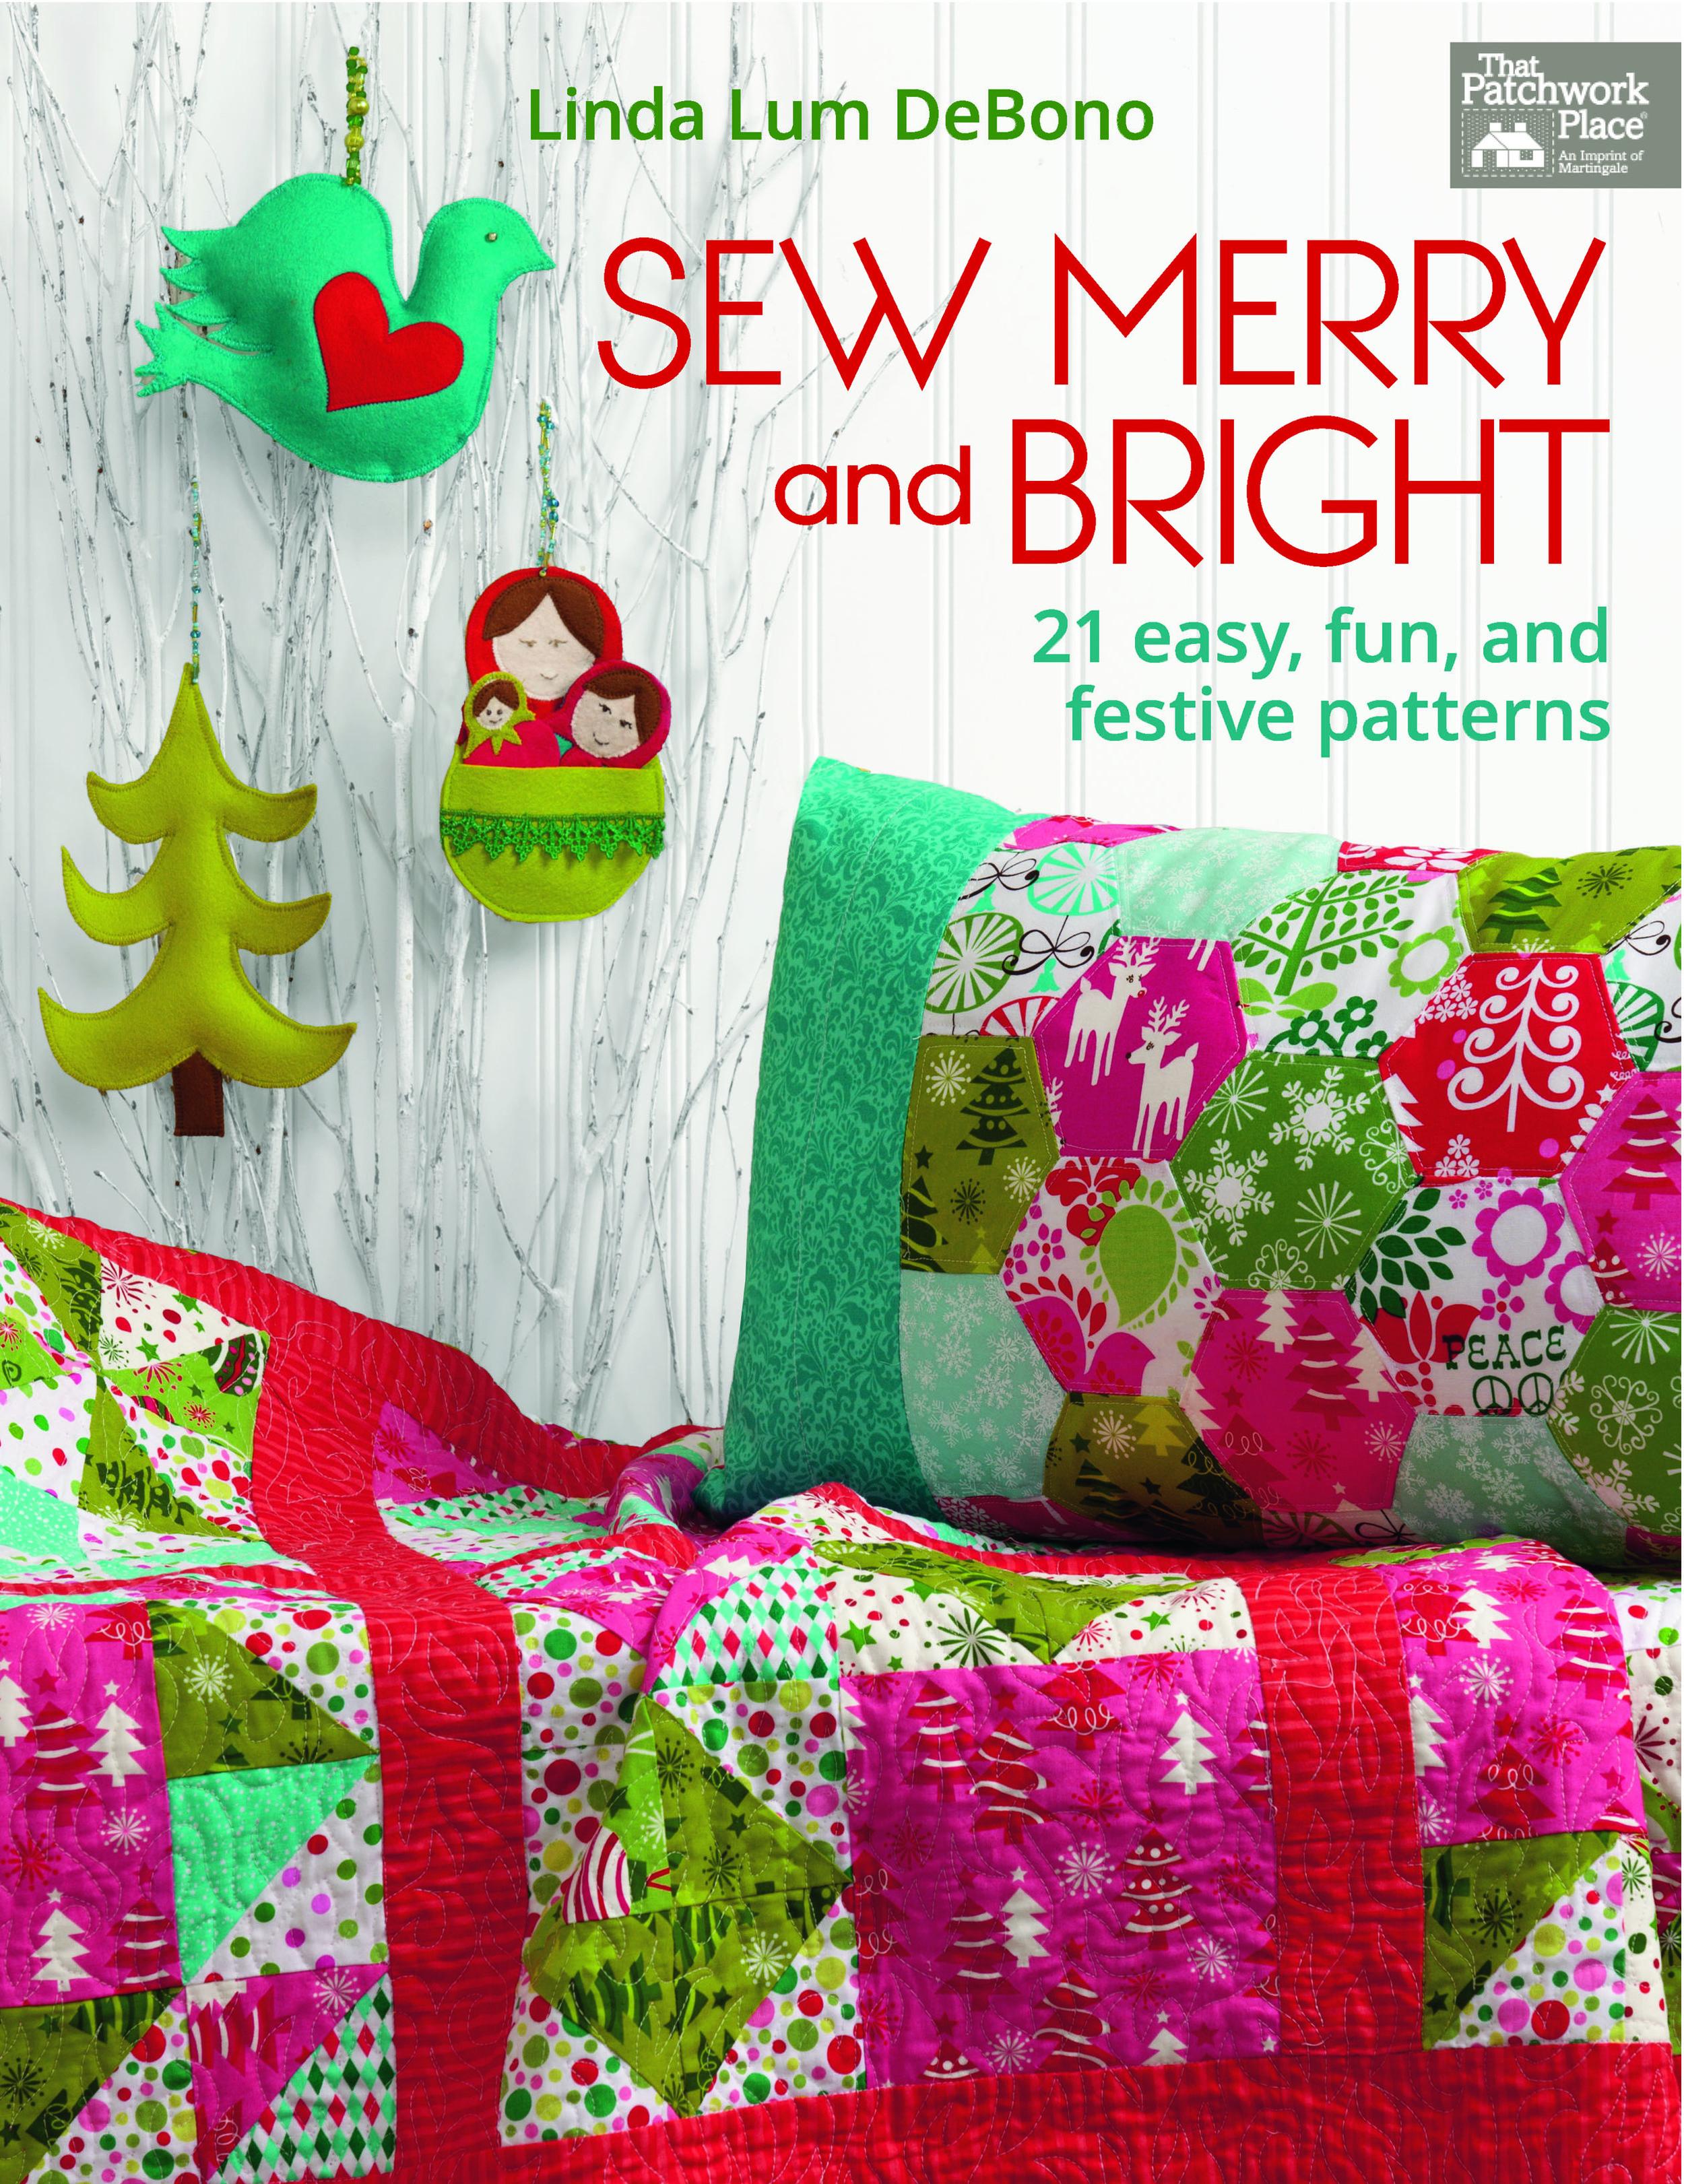 Sew Merry and Bright  by Linda Lum DeBono